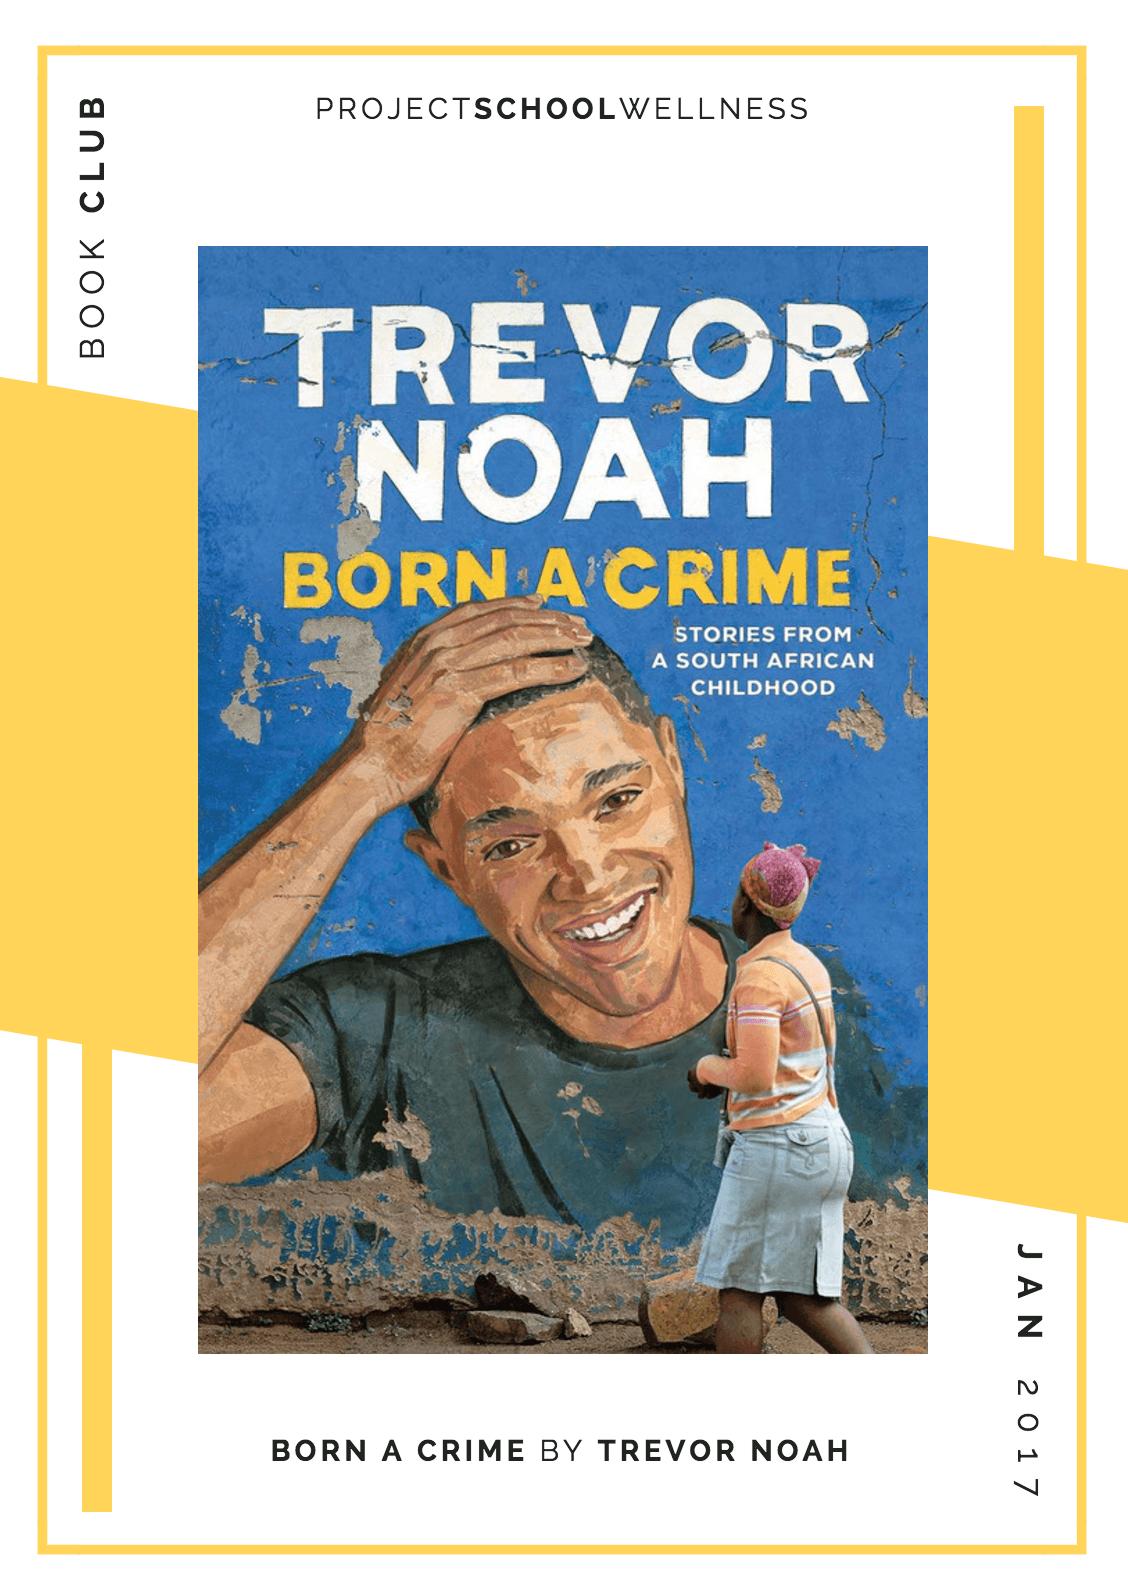 Trevor Noah, Born a Crime - Project School Wellness' Teacher Book Club, must read books for every teacher!